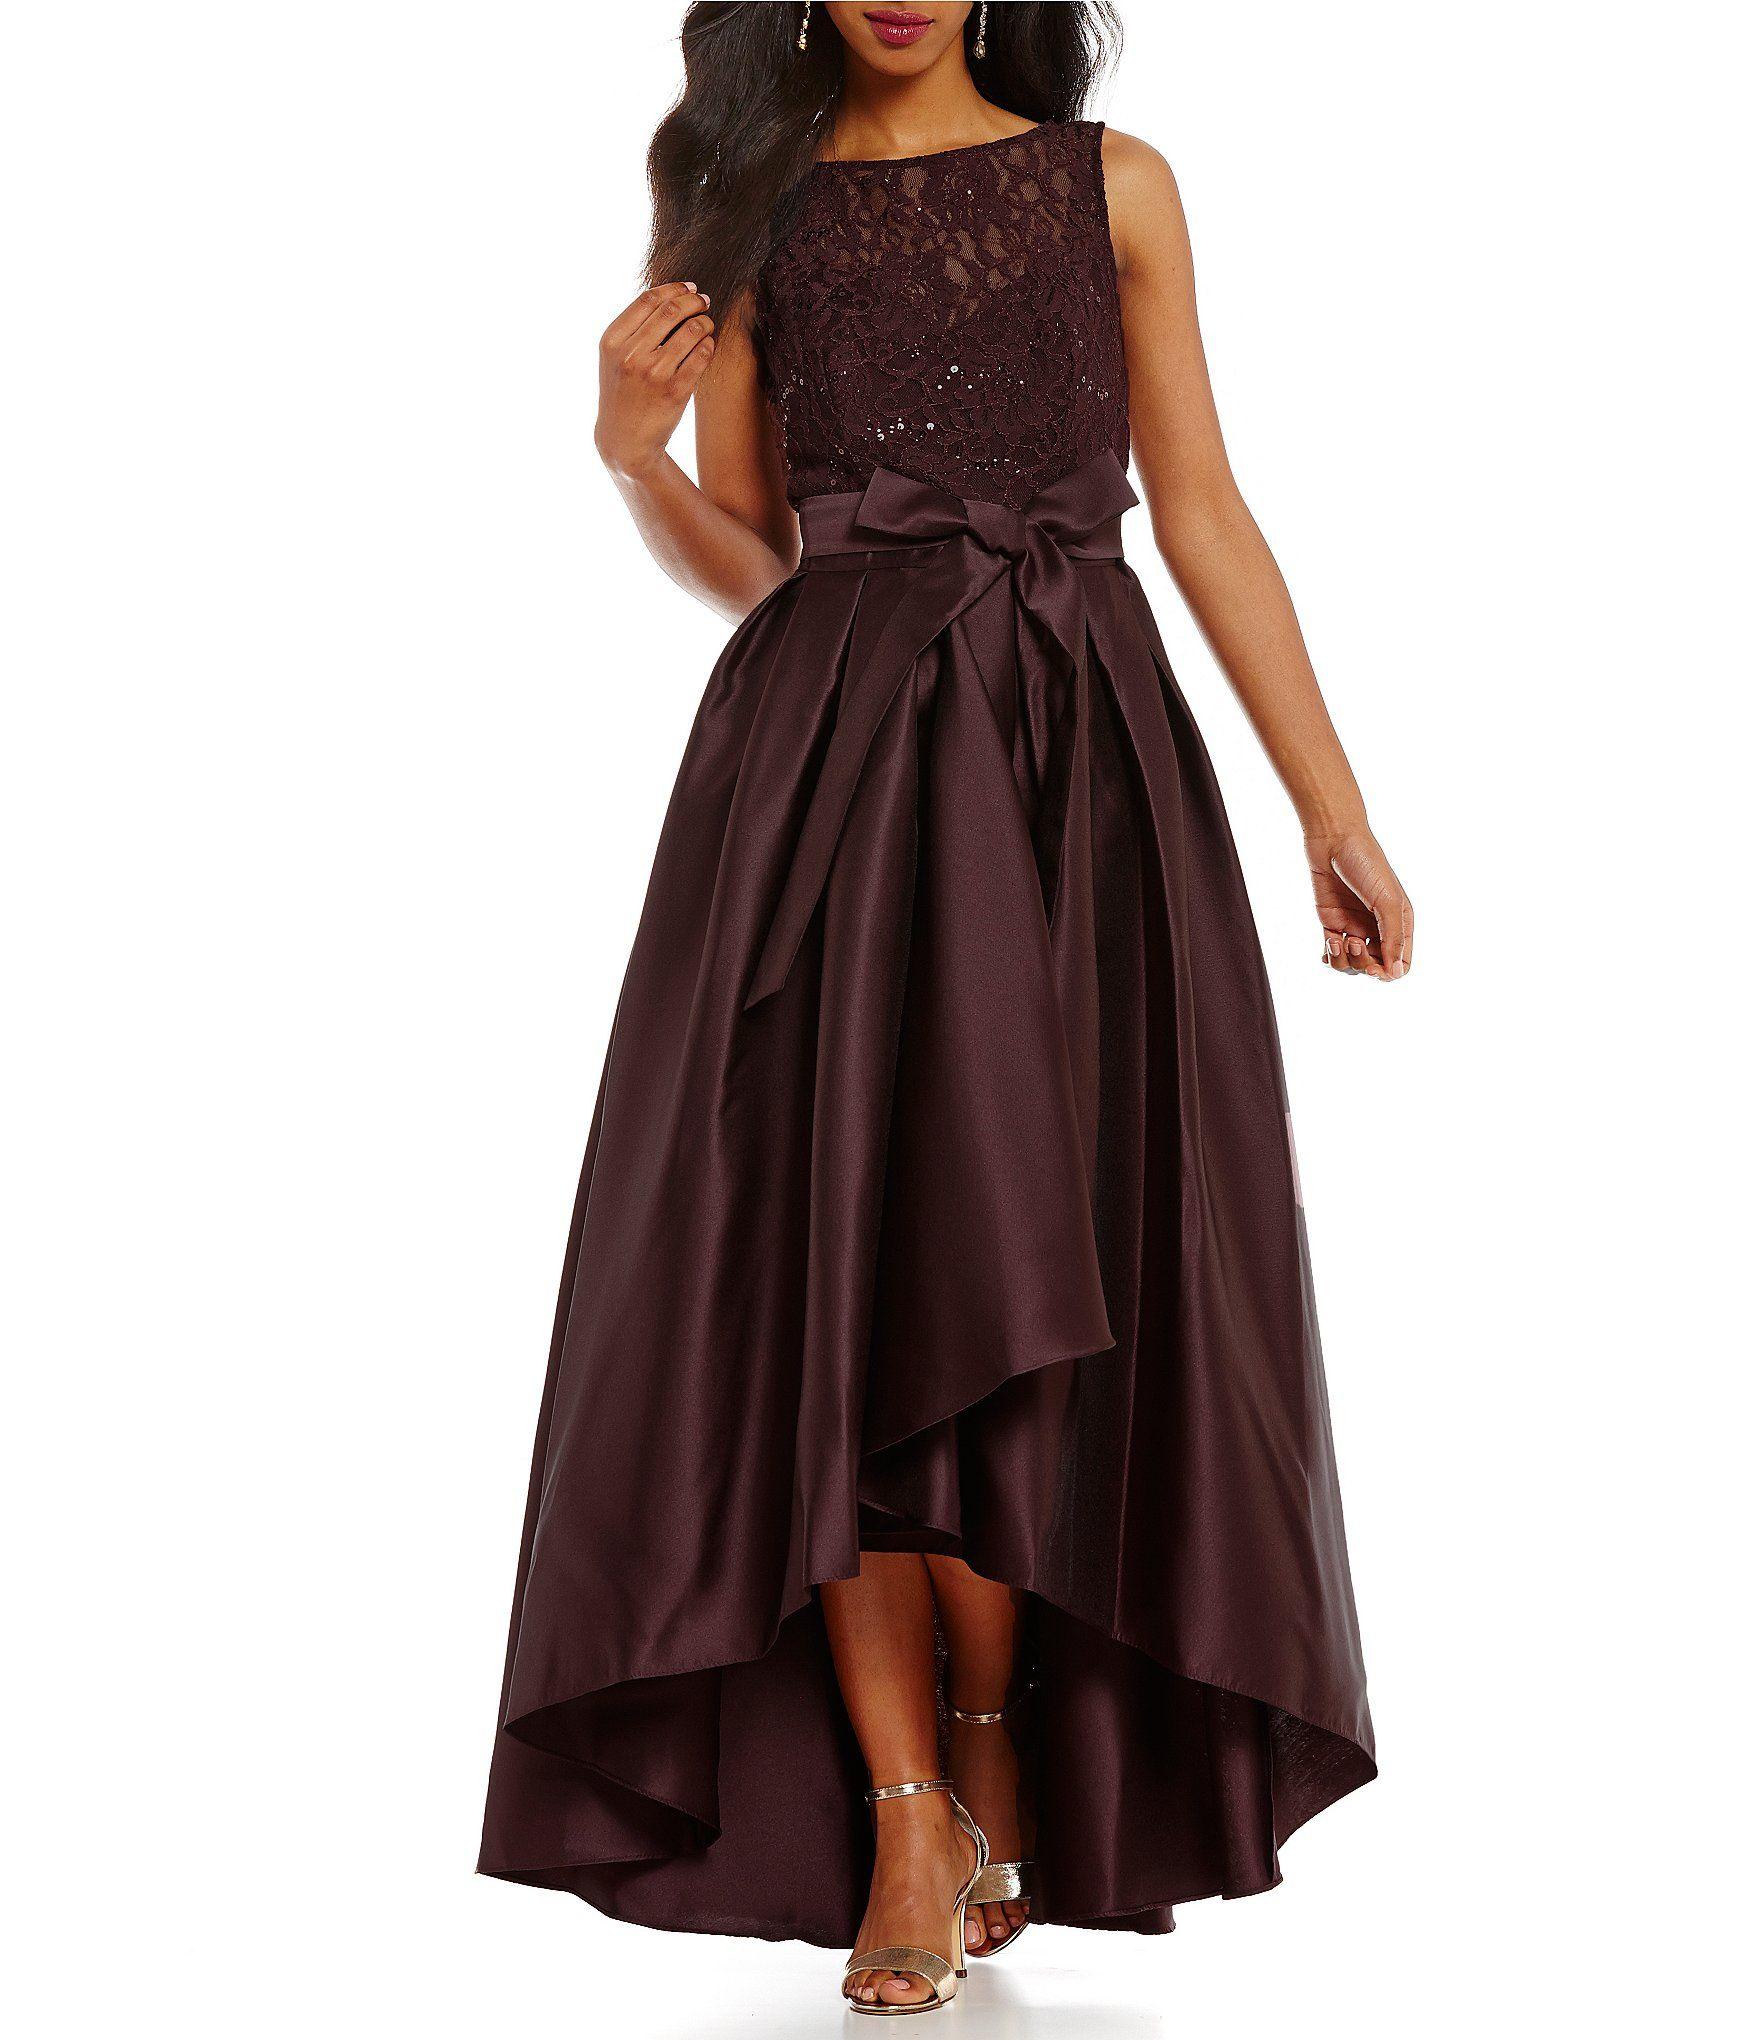 Wedding dresses dillards  Purple Mother of the Bride Dresses  Dillards Clothing accessories